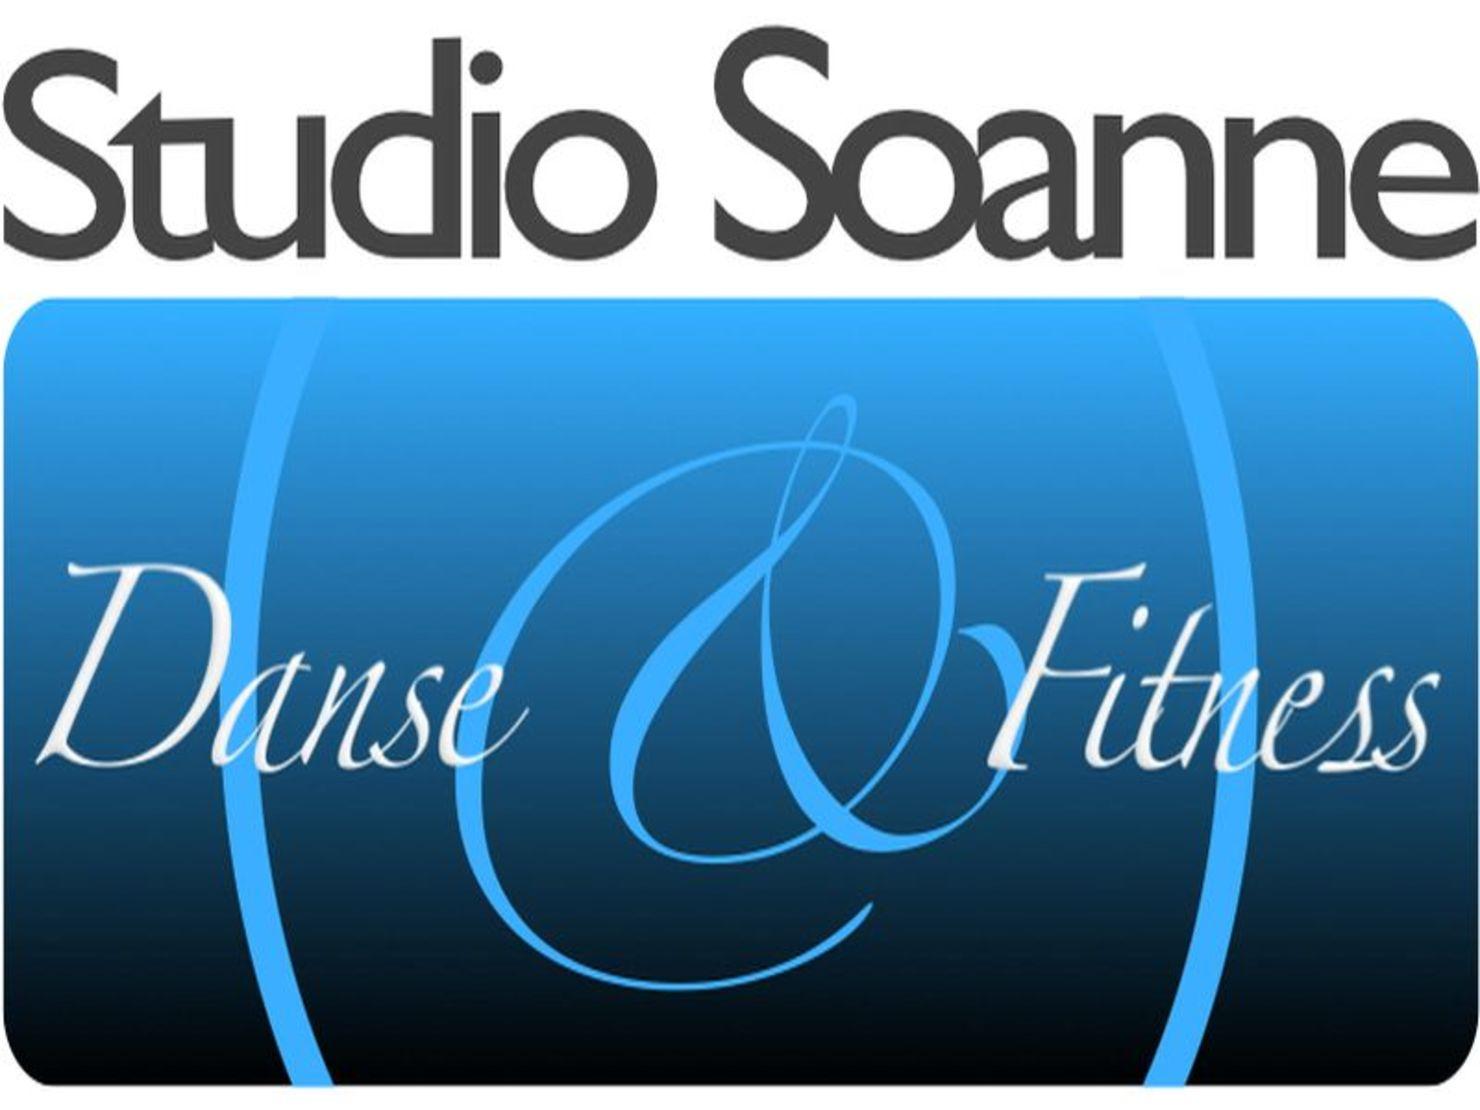 Studio Soanne